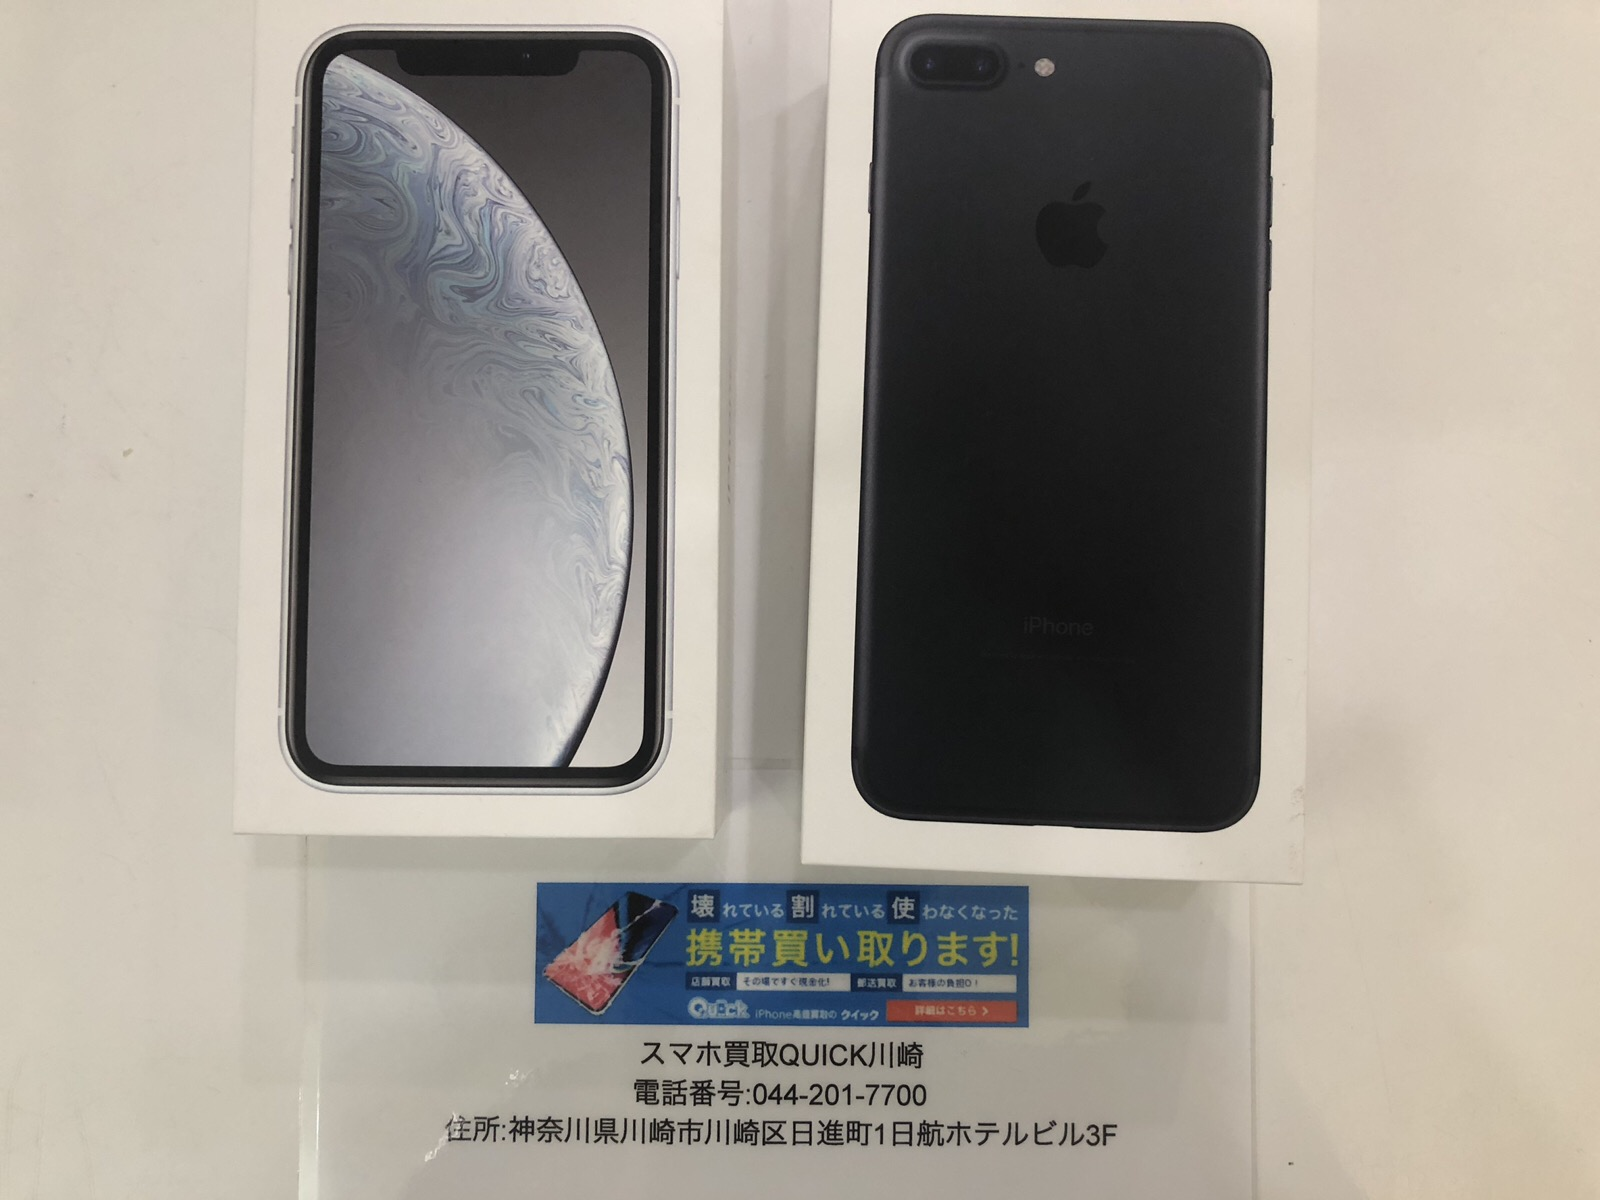 iphone買取実績_武蔵小杉エリアのお客様